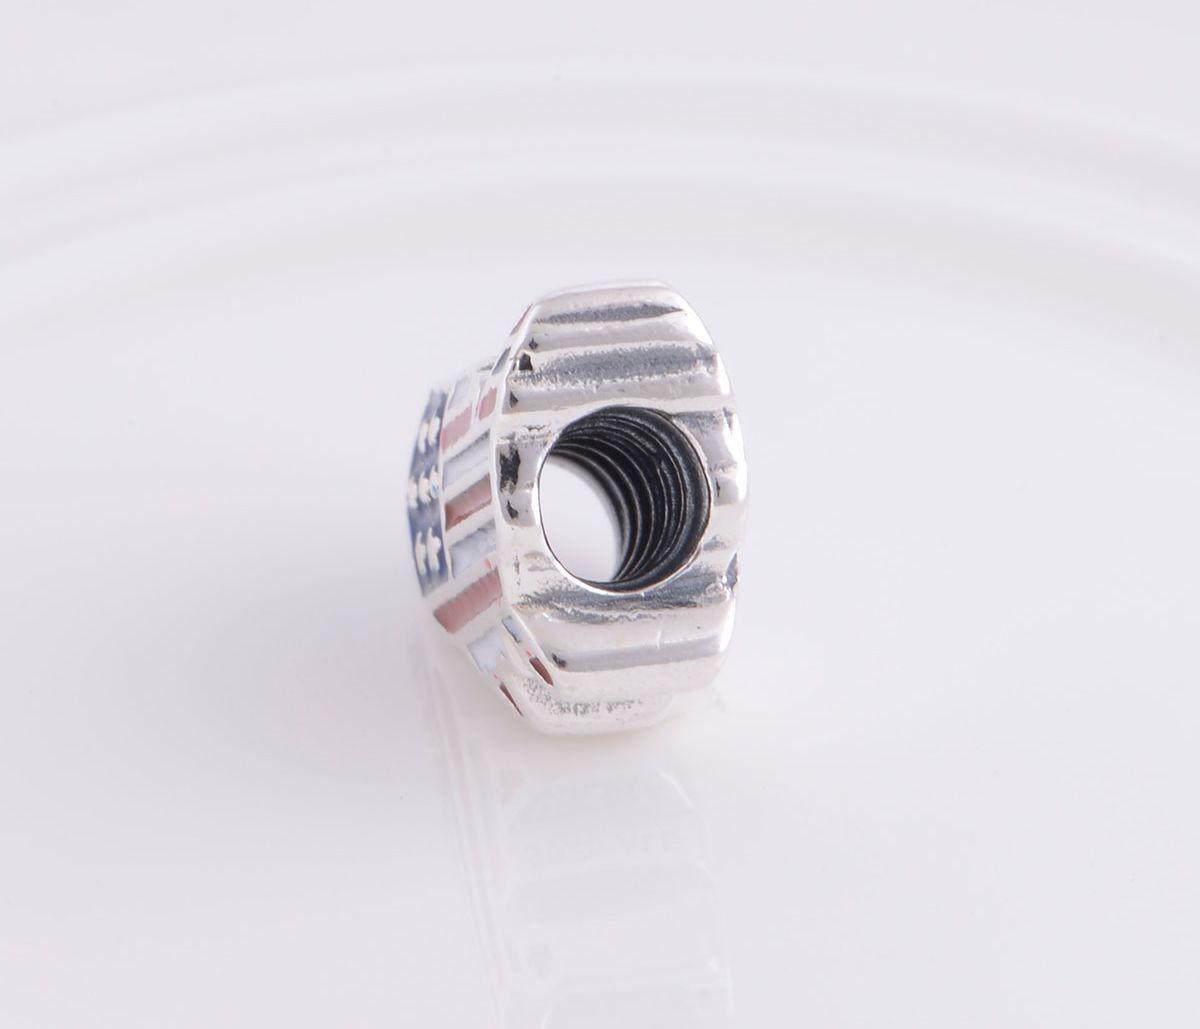 Autentico 925 Sterling Silver US Nation Icon Bead Adatto europeo Pandora Jewelry Charm Beads Braccialetti